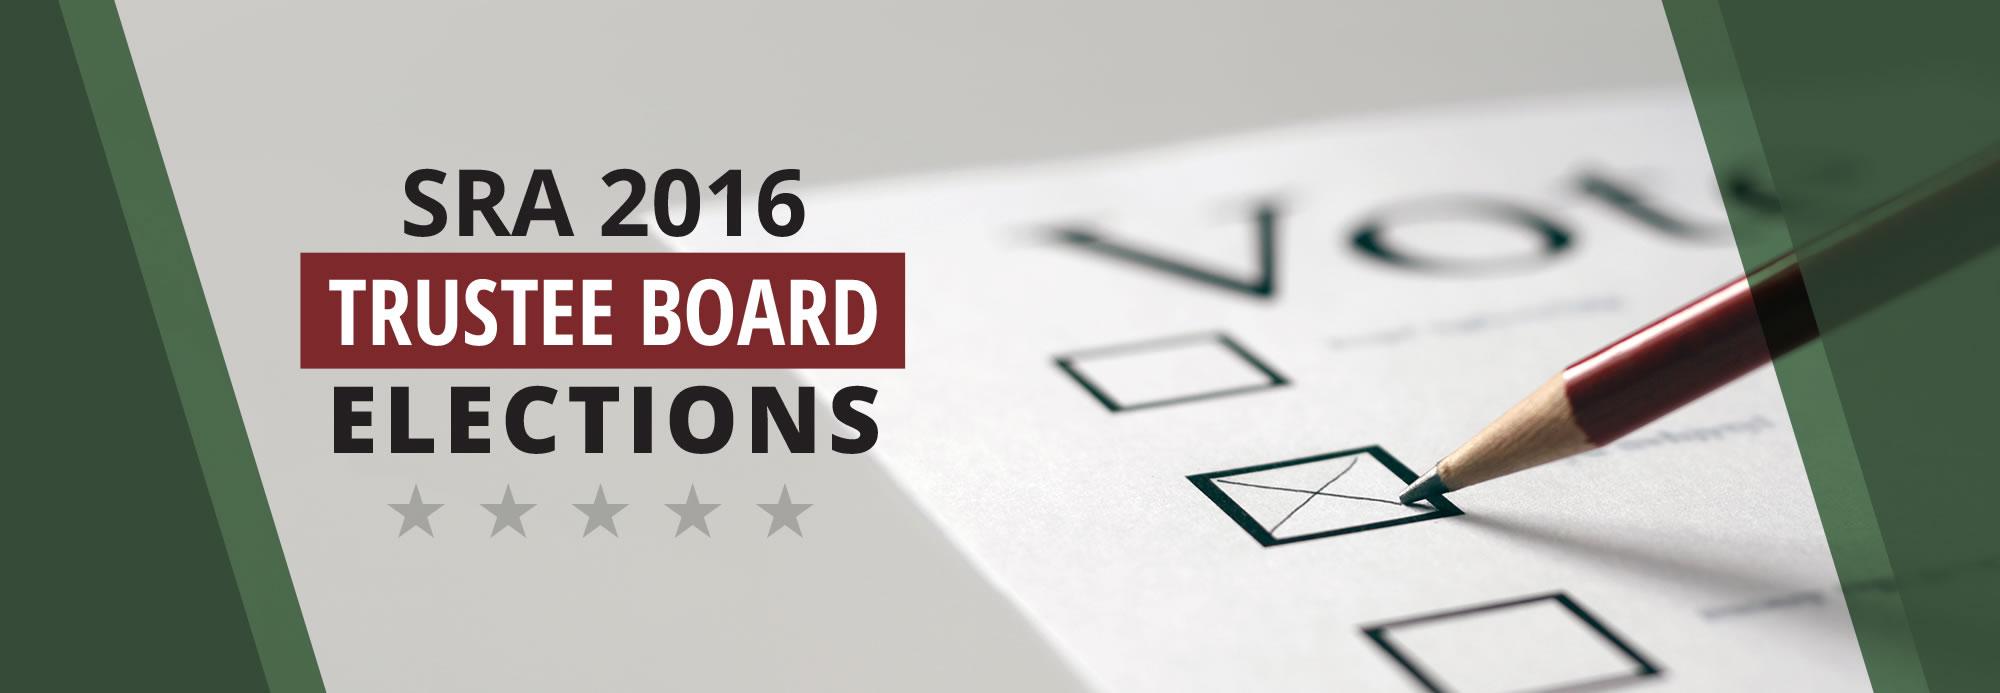 SRA 2016 Trustee Board Elections